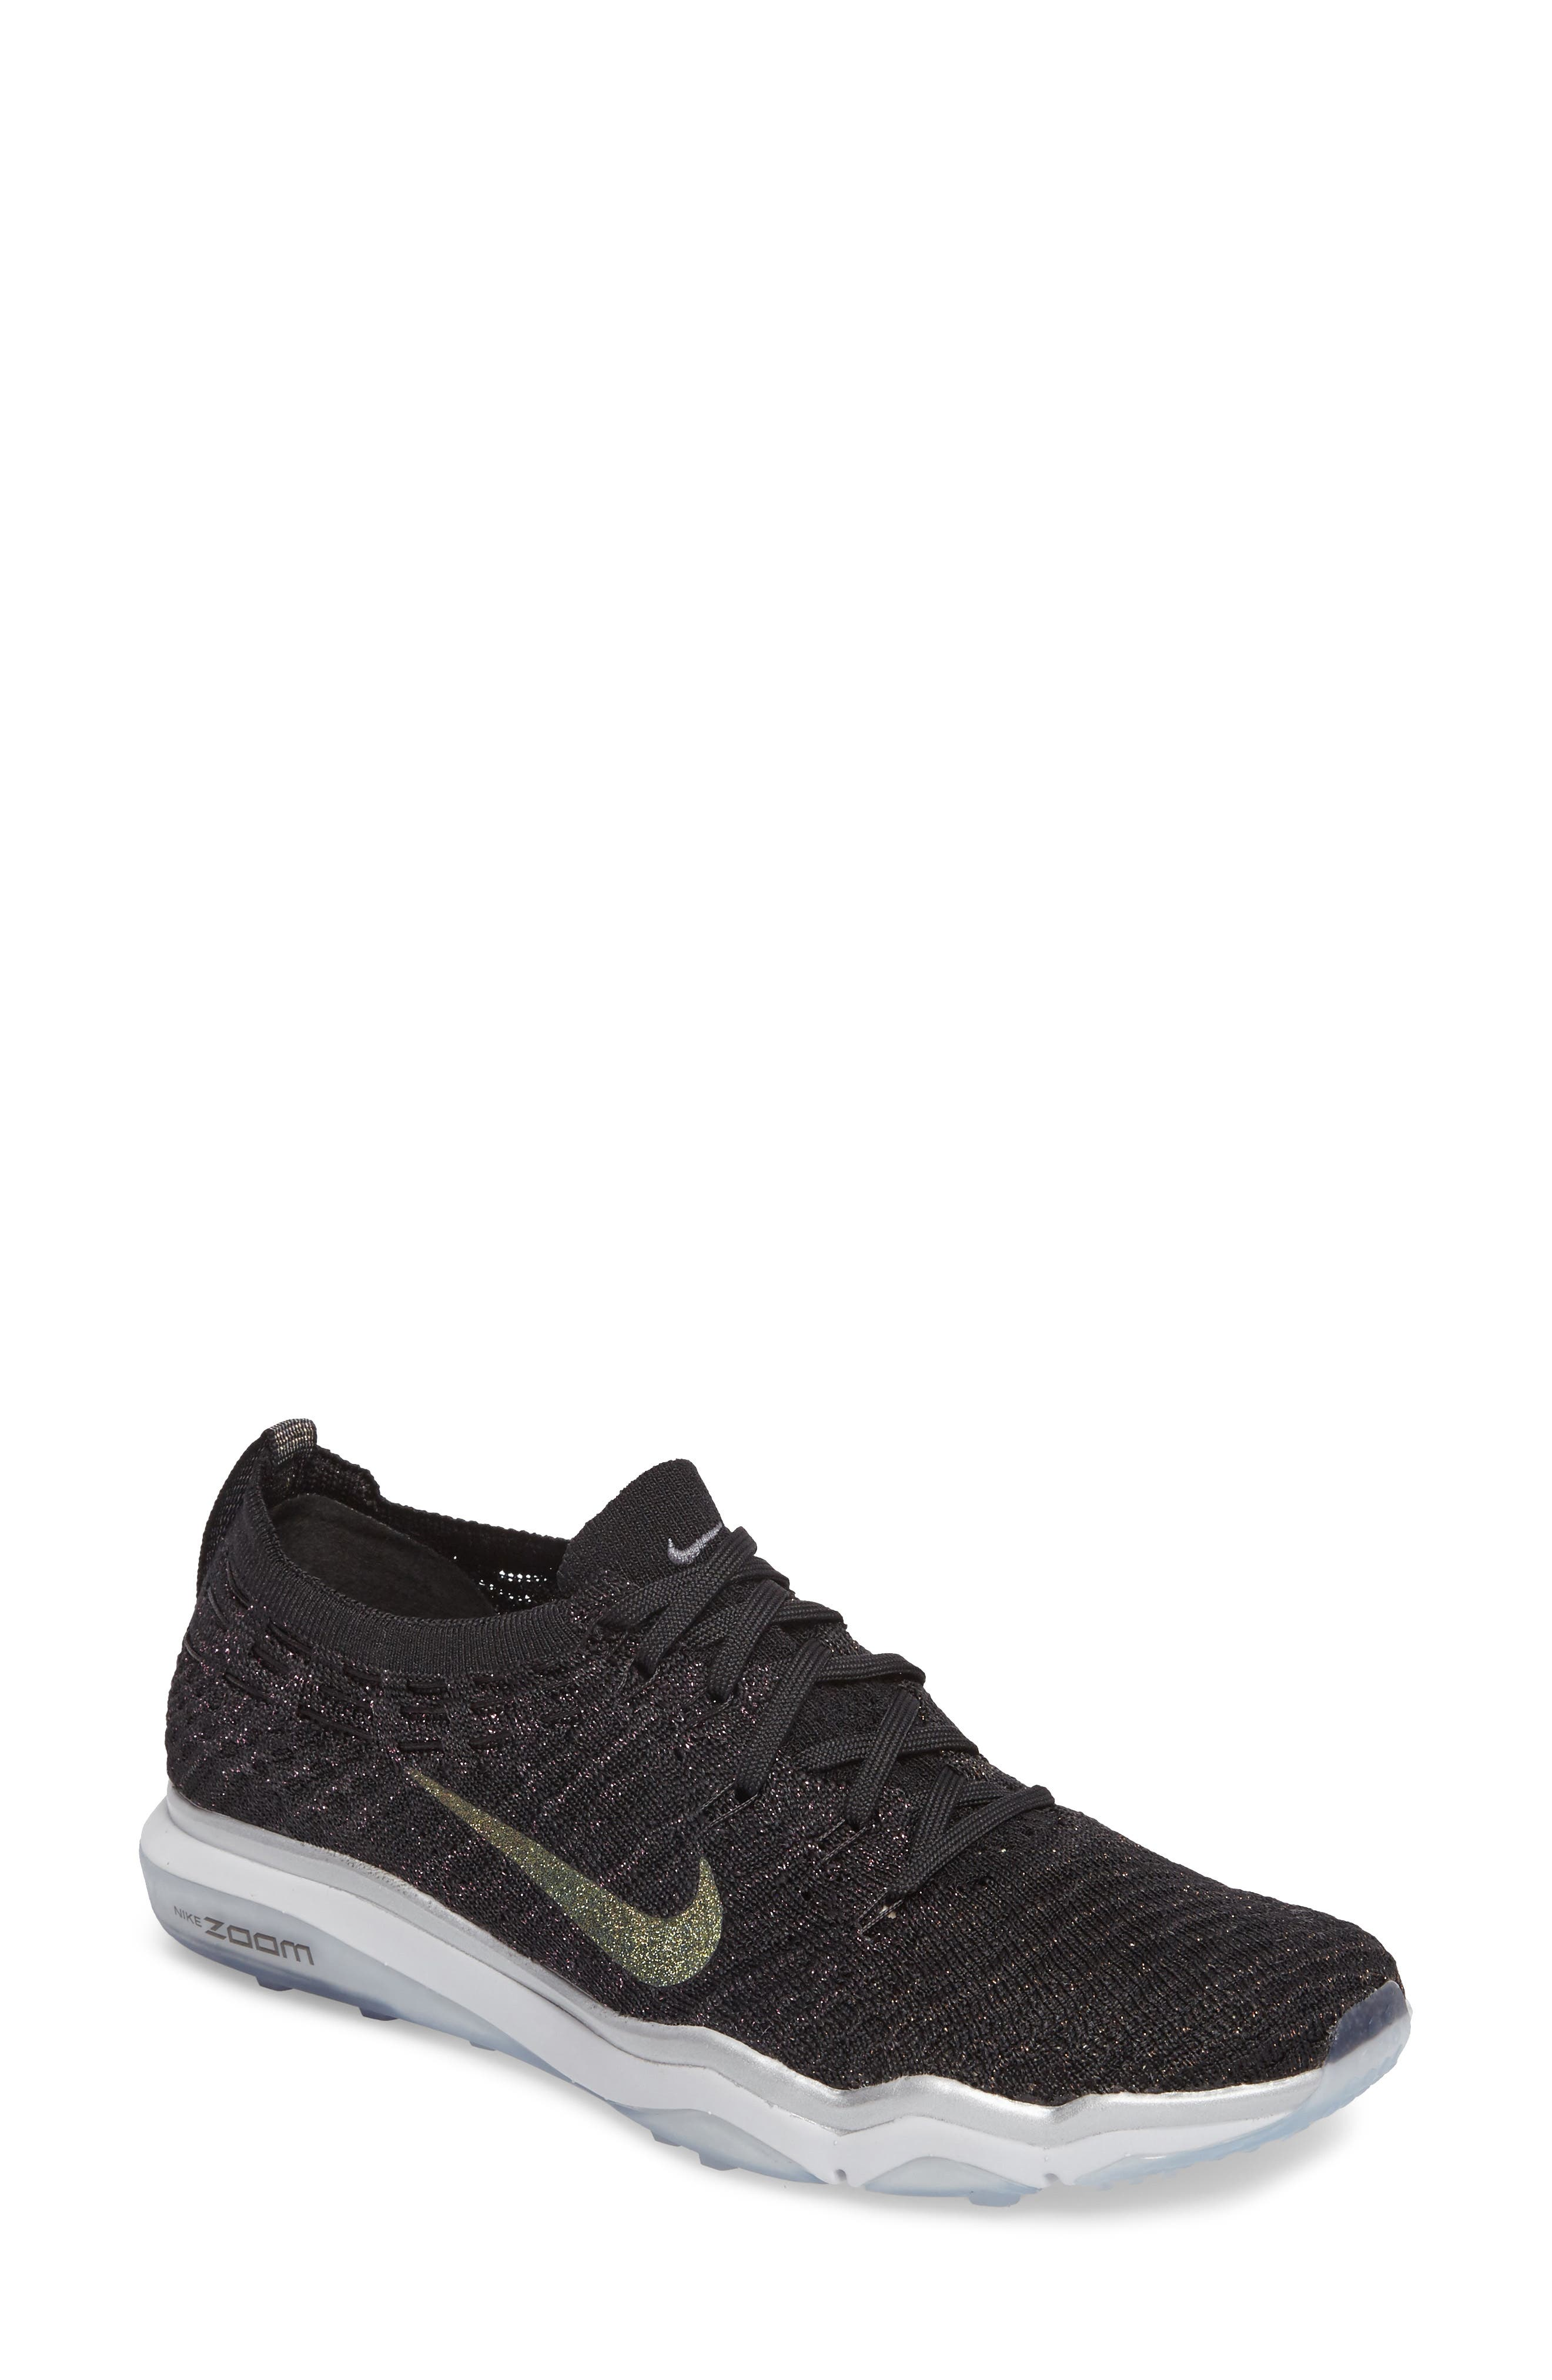 NIKE Women'S Air Zoom Fearless Flyknit Metallic Running Sneakers From  Finish Line, Black Dark Grey